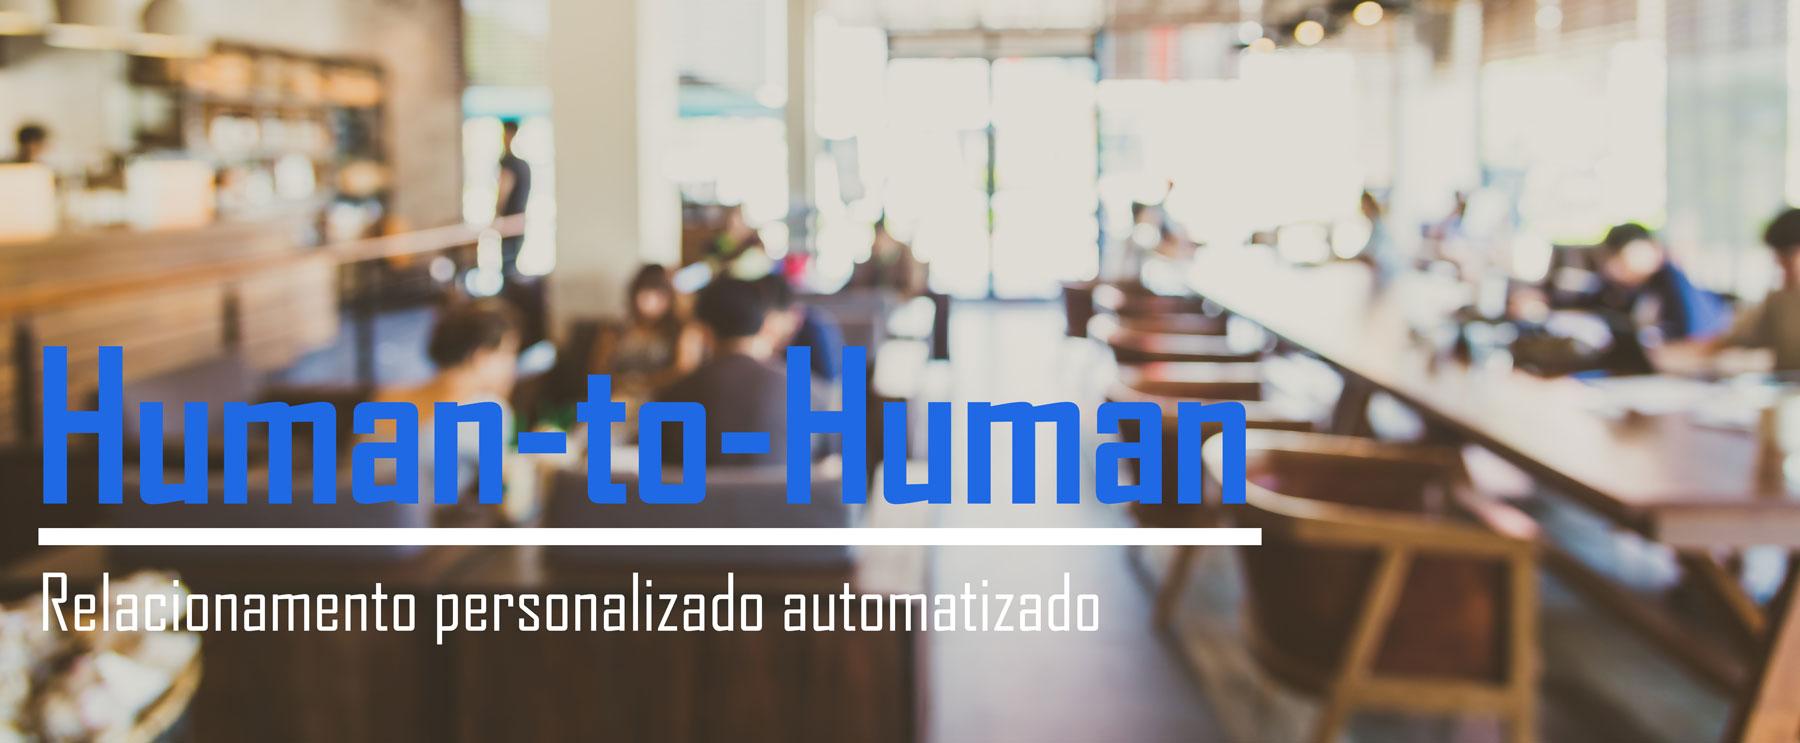 Human-To-Human: relacionamento personalizado automatizado